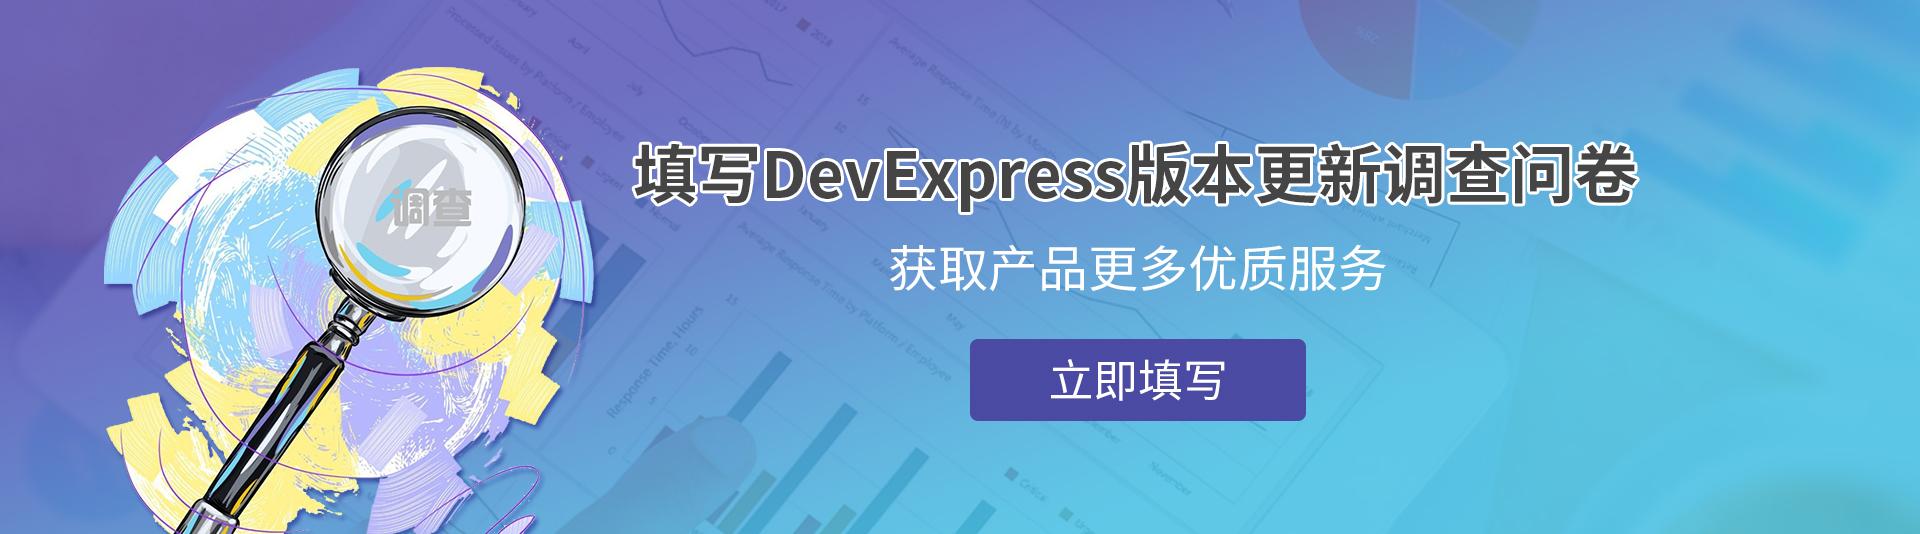 DevExpress新版调查问卷